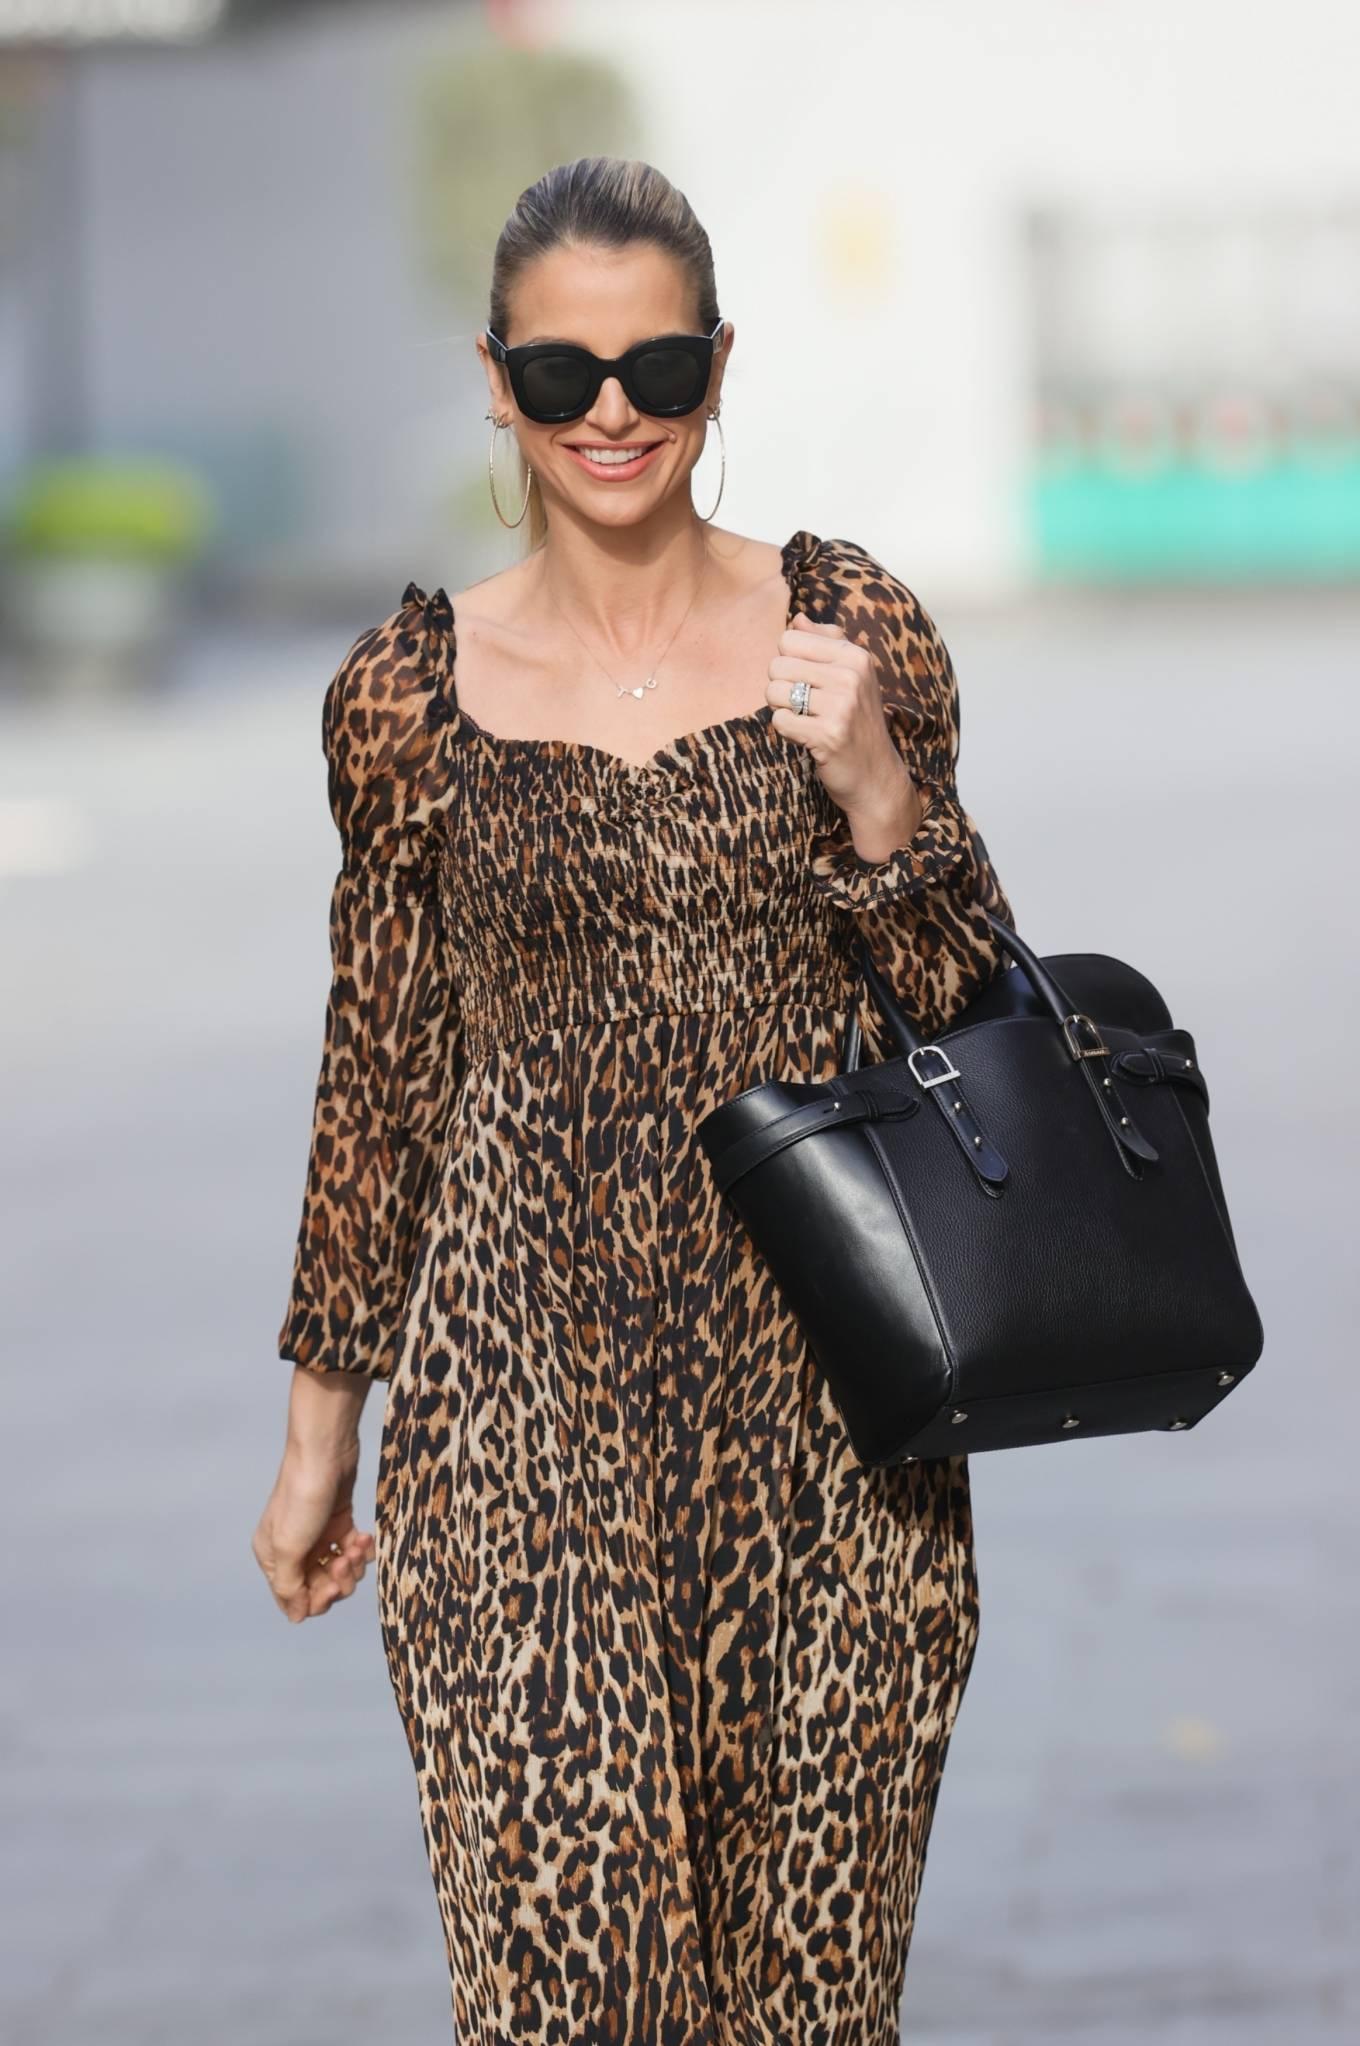 Vogue Williams - Seen in animal print dress in London